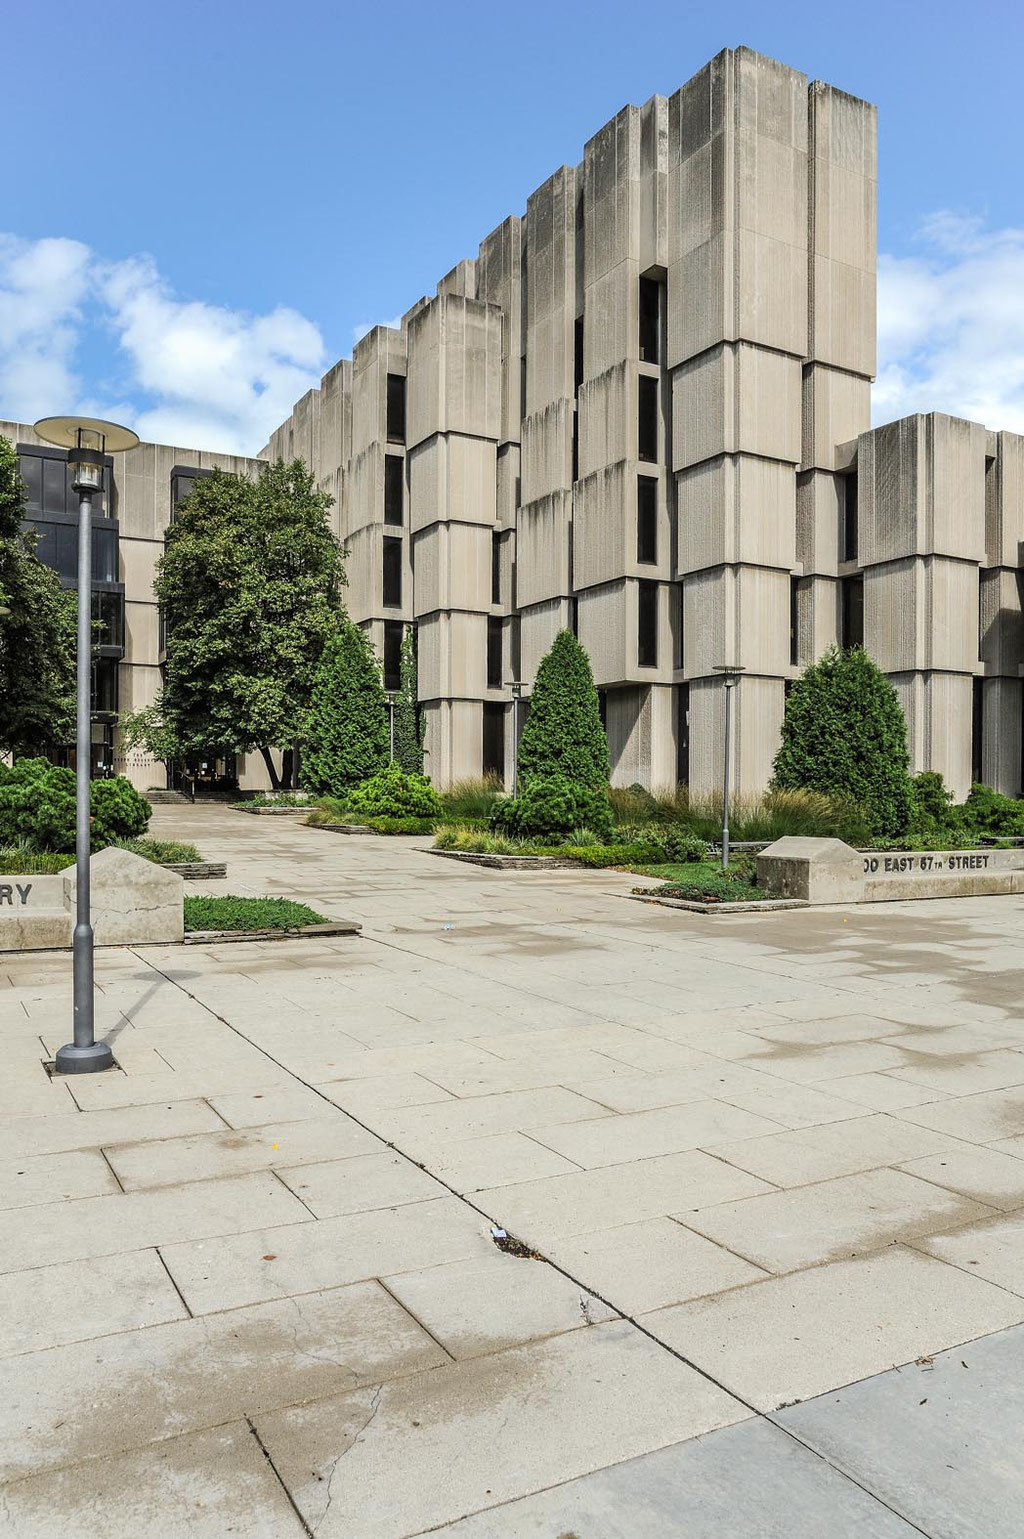 Joseph Regenstein Library (Skidmore, Owings & Merrill), University of Chicago, Chicago (USA)